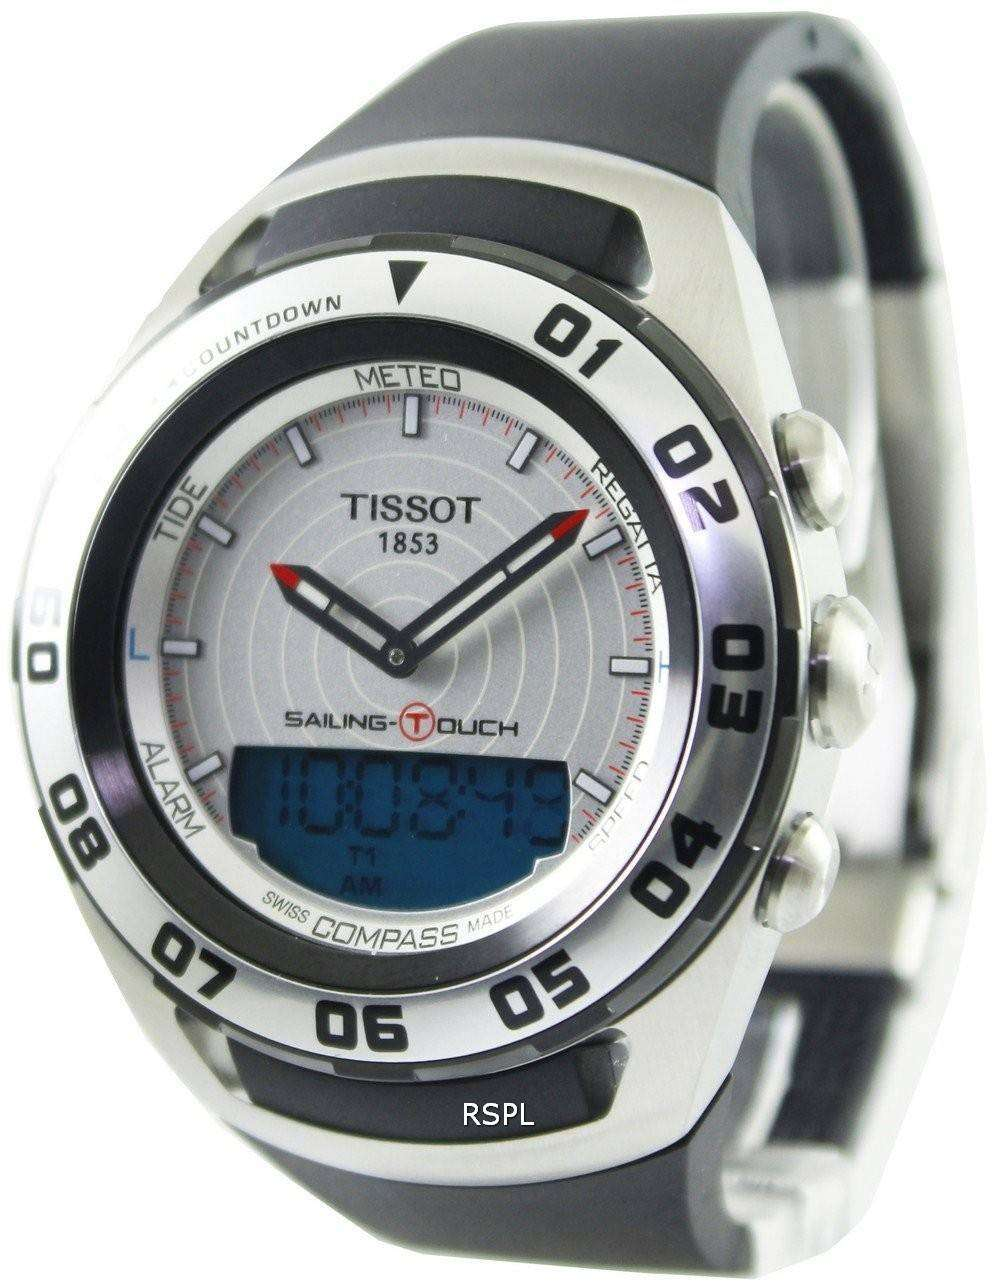 Bit no boaty - Tissot sailing touch watch? - YBW